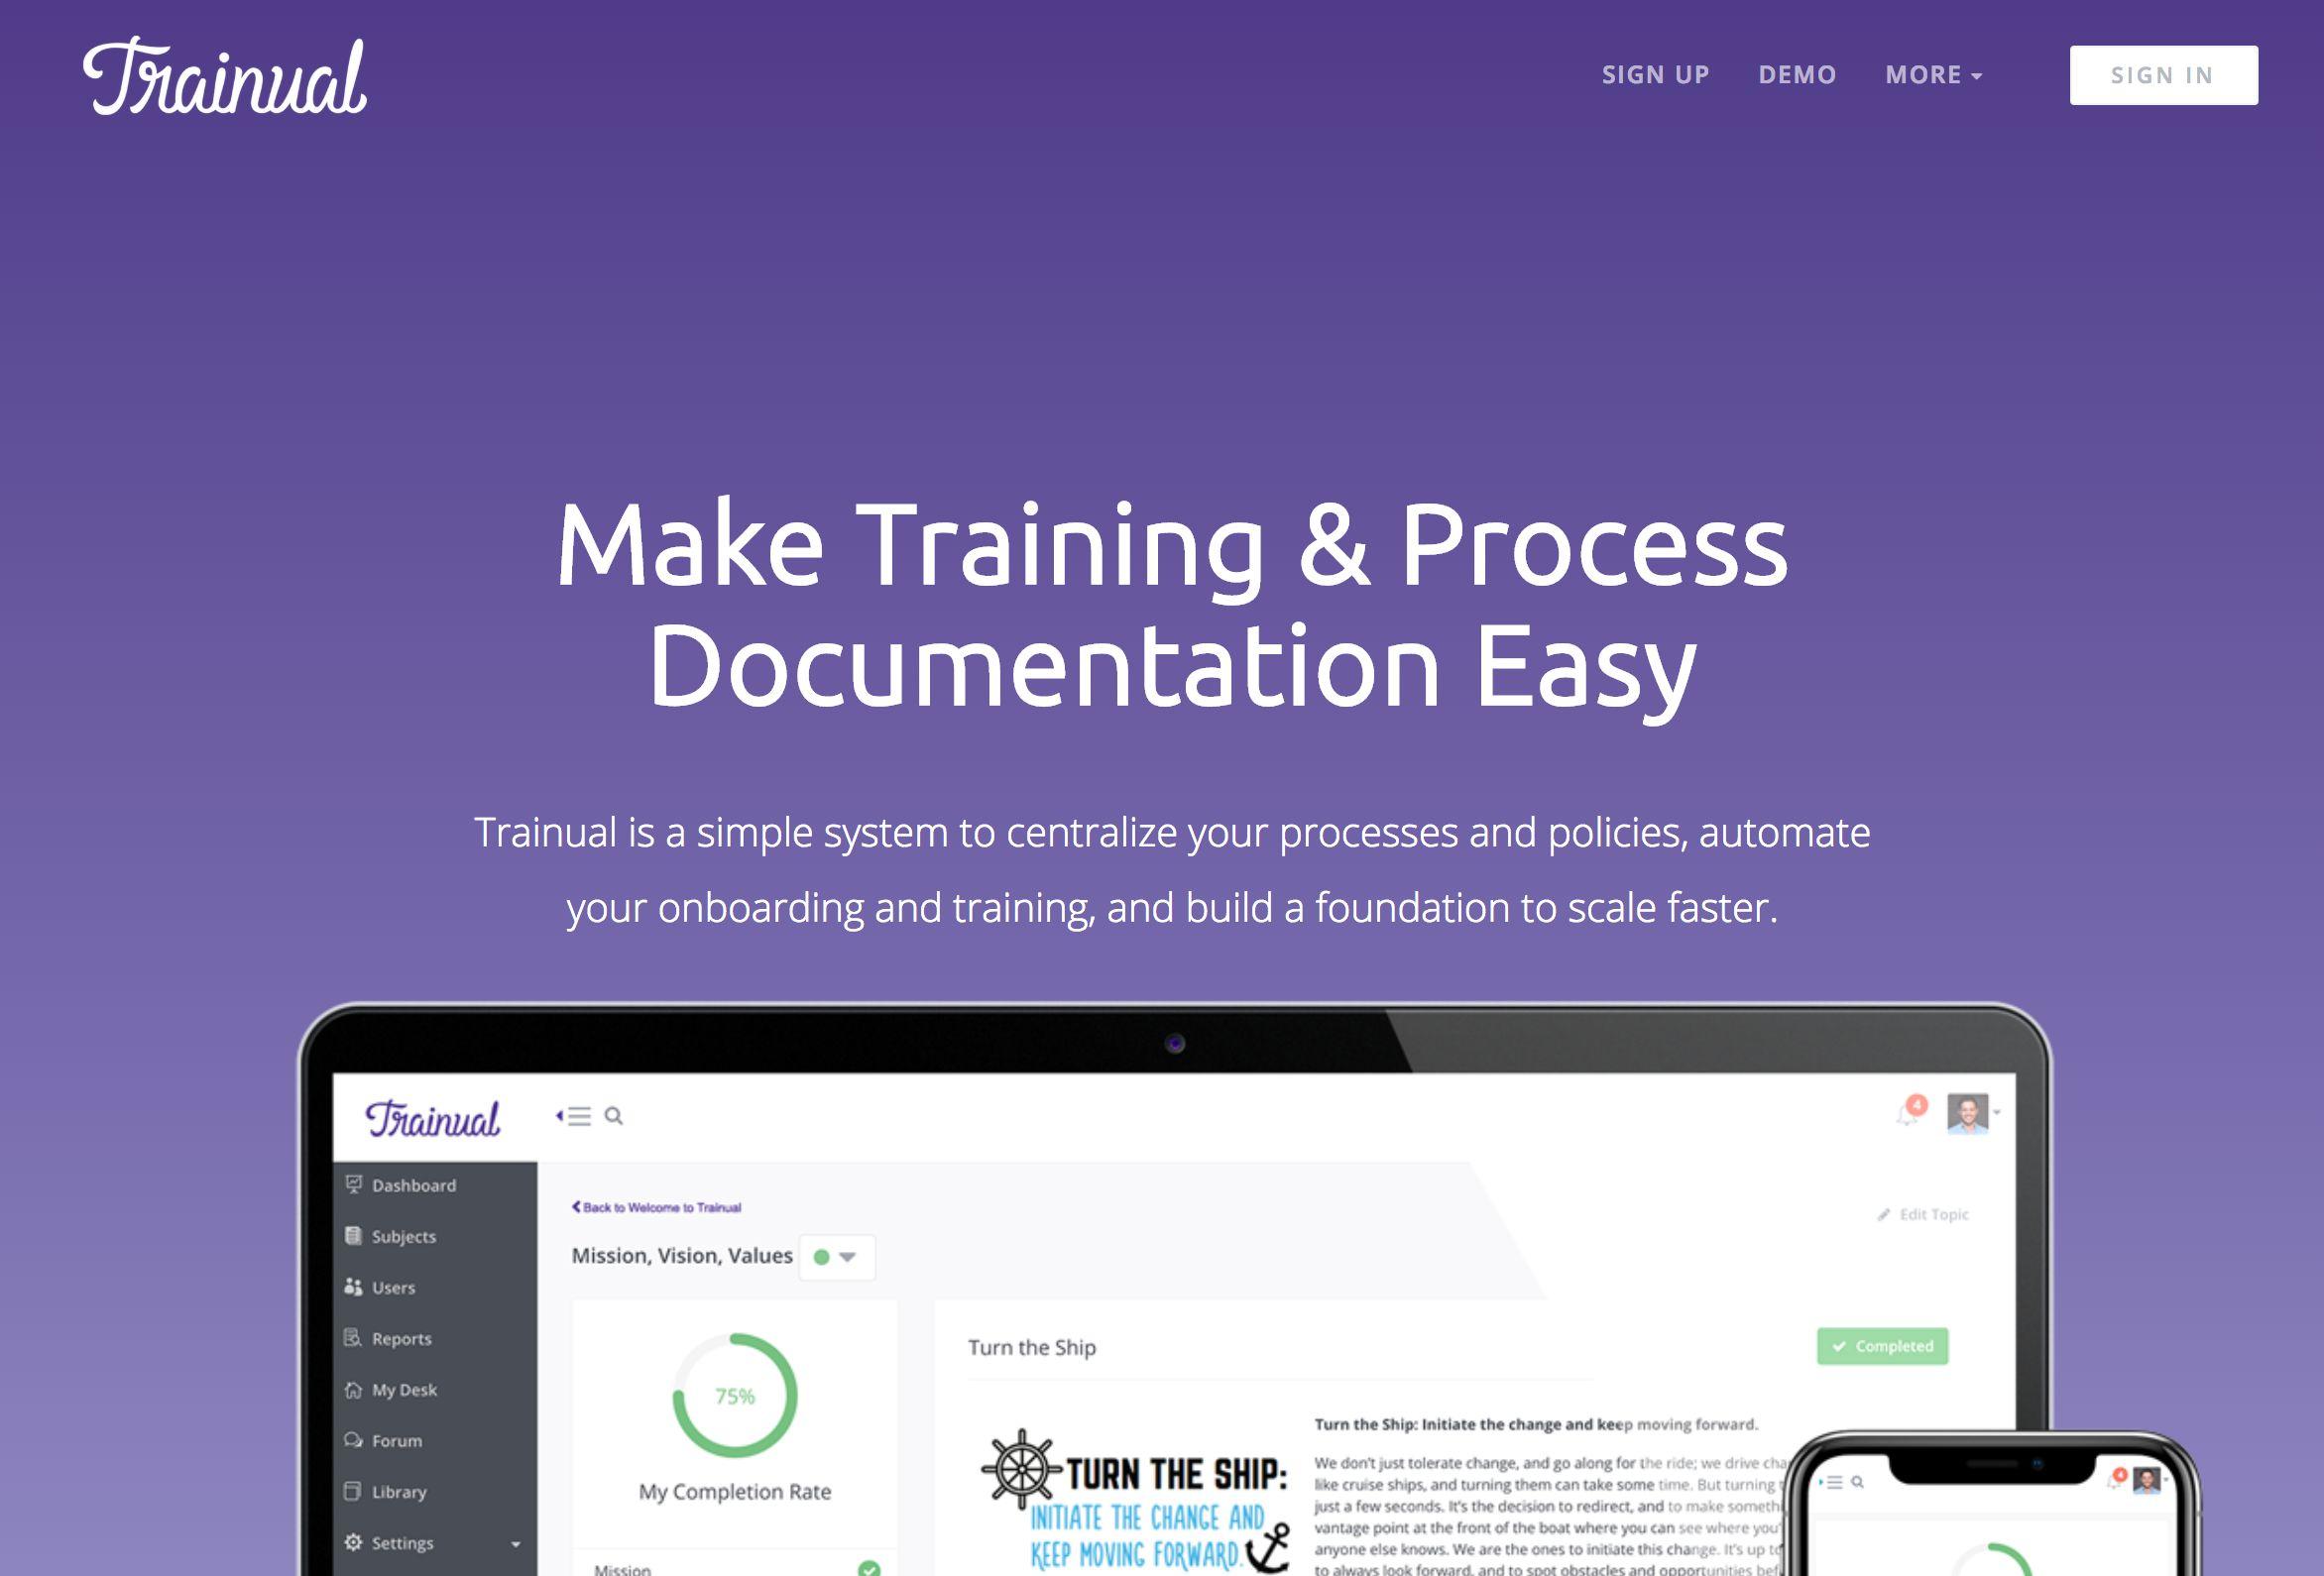 Trainual home page